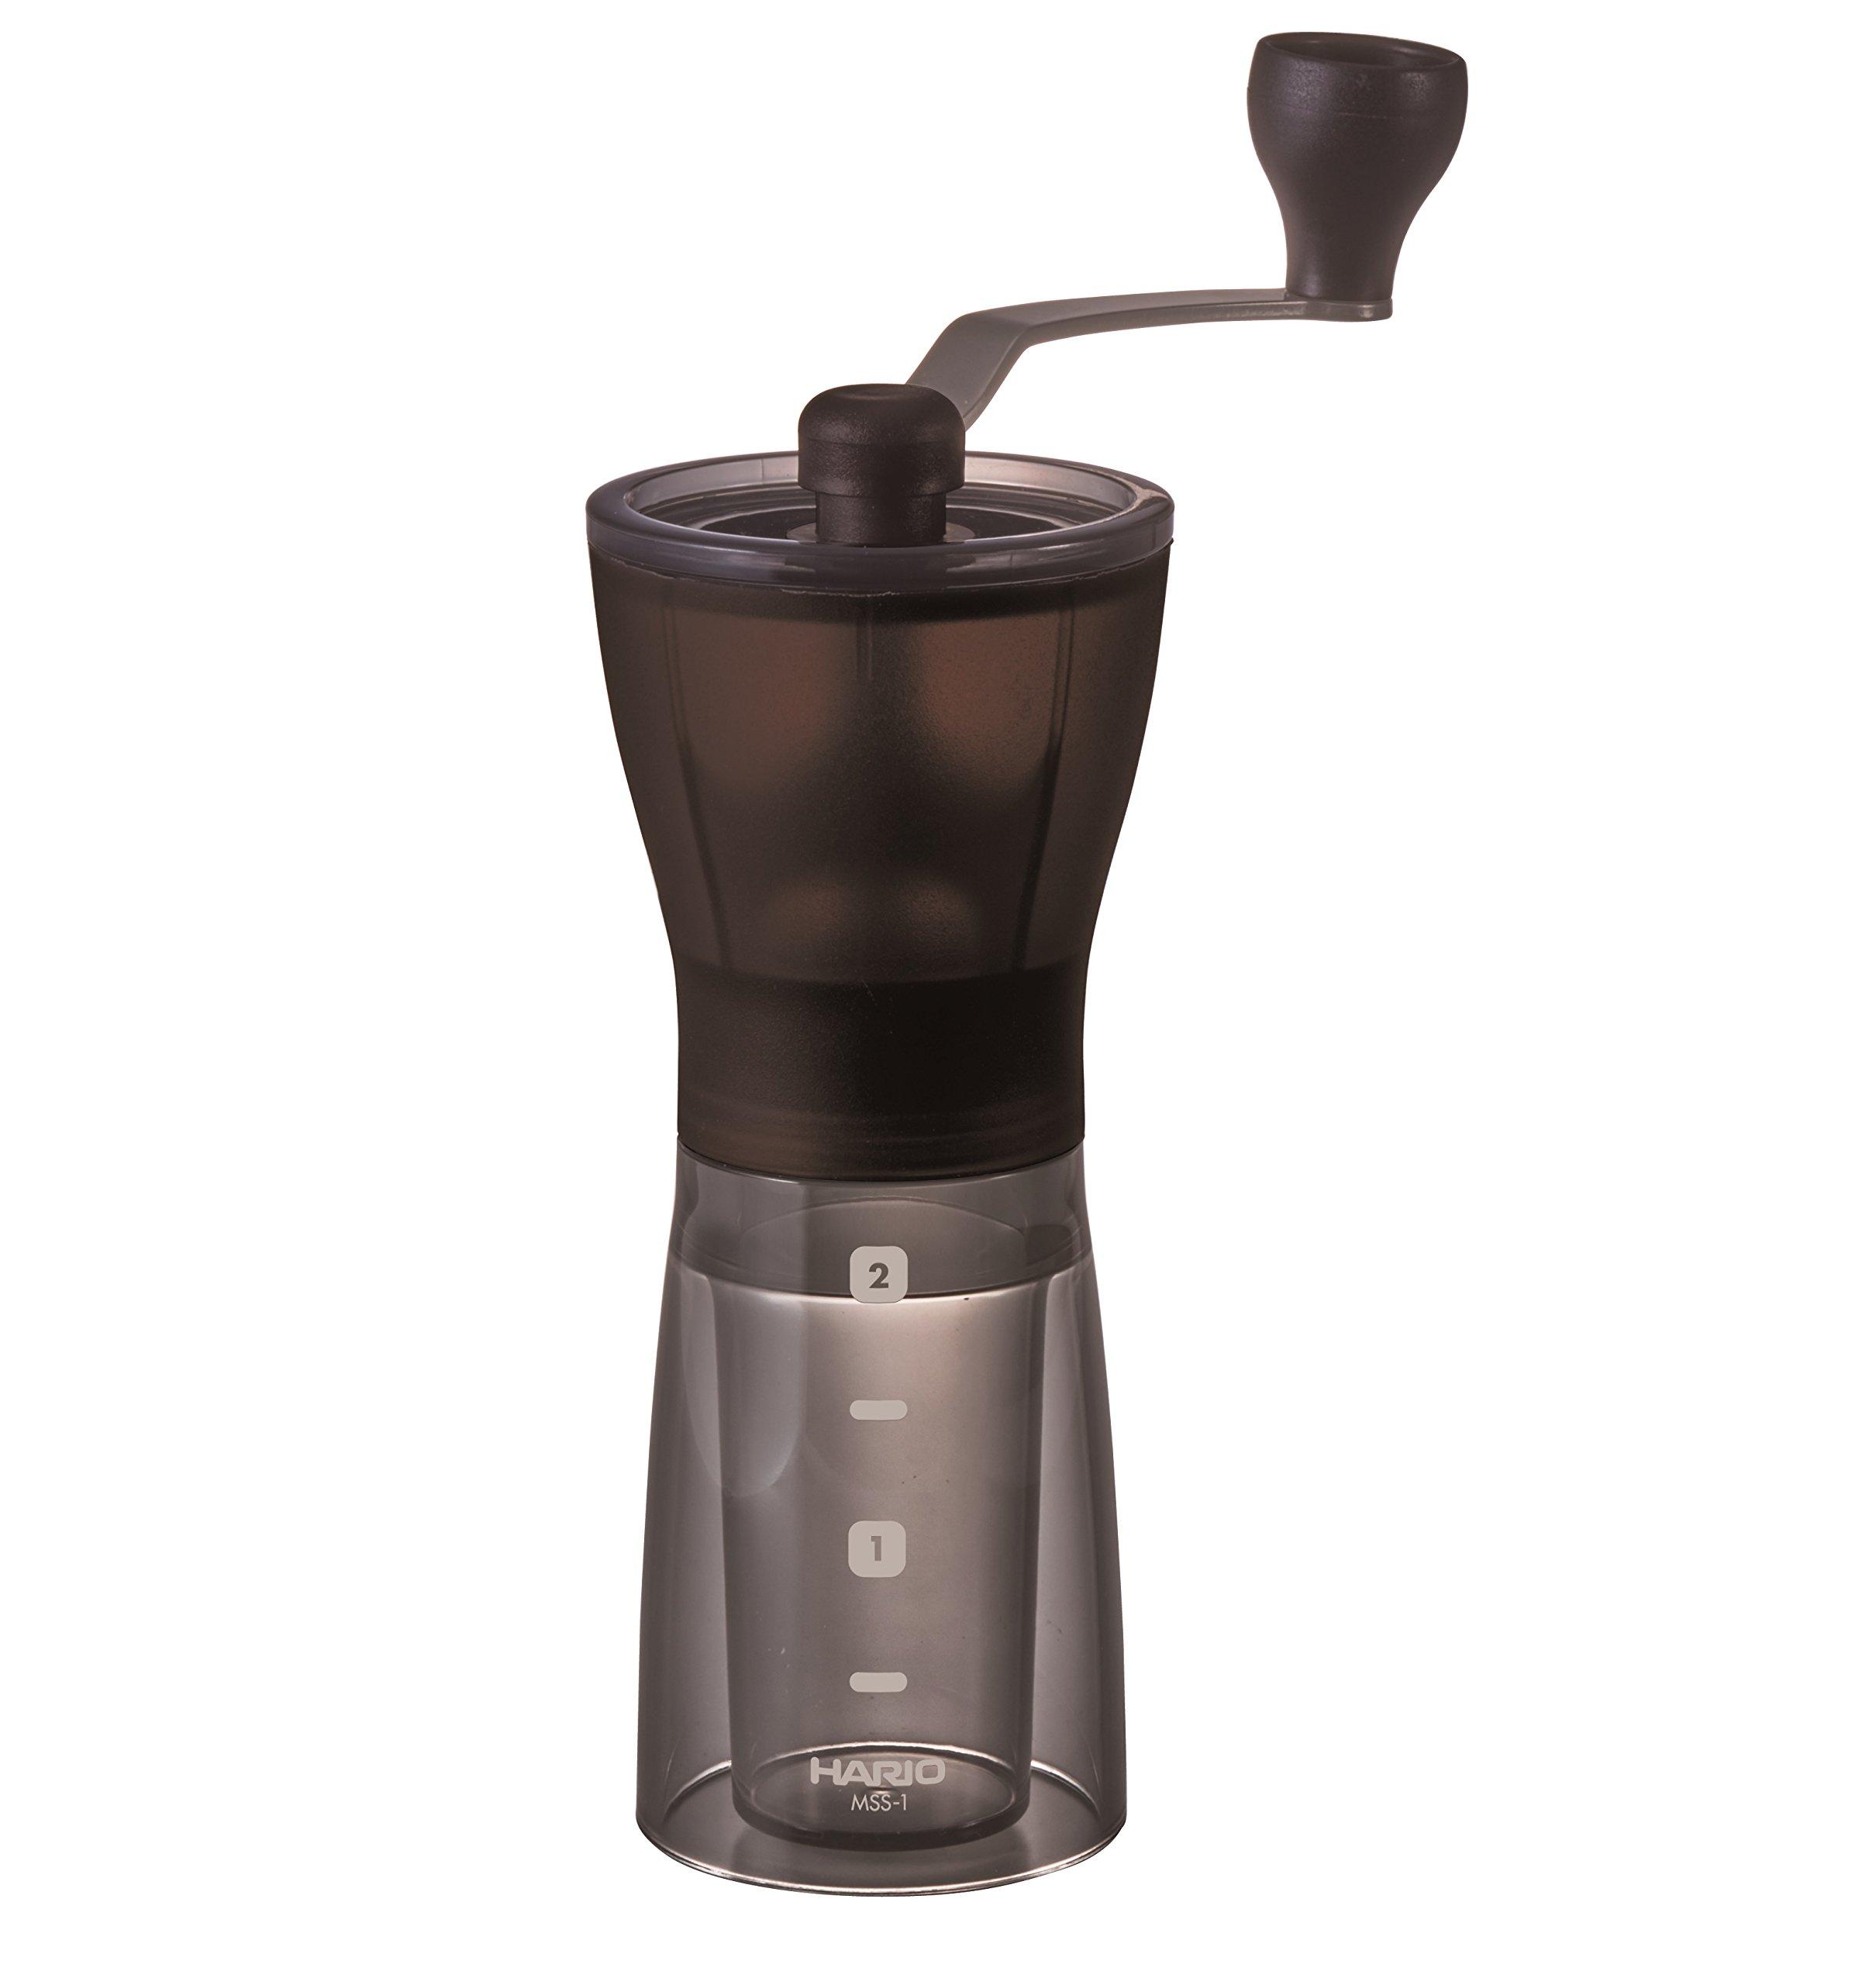 Hario MSS 1DTB Ceramic Coffee Mill Mini Slim Plus